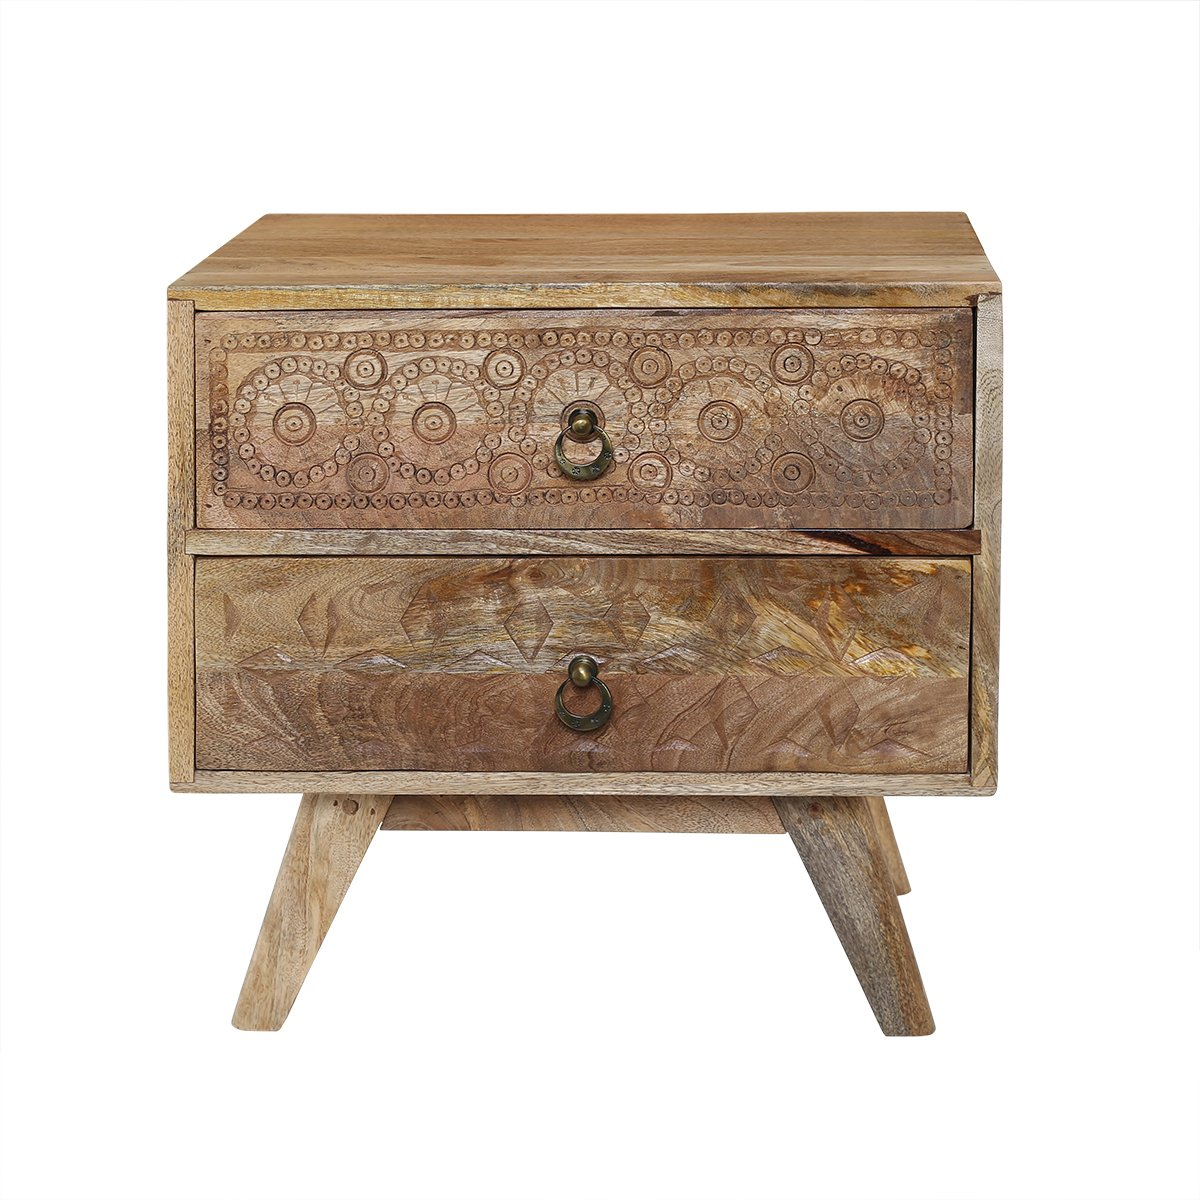 storeindya Wooden Keepsake Box/Keepsake Box with Drawers/Chest of Drawers with Cabinet/Keepsake Box for Girls/Storage Decorative Boxes/Mini Wood Cabinet/Small Wood Cabinet (Rough Wood Collection)